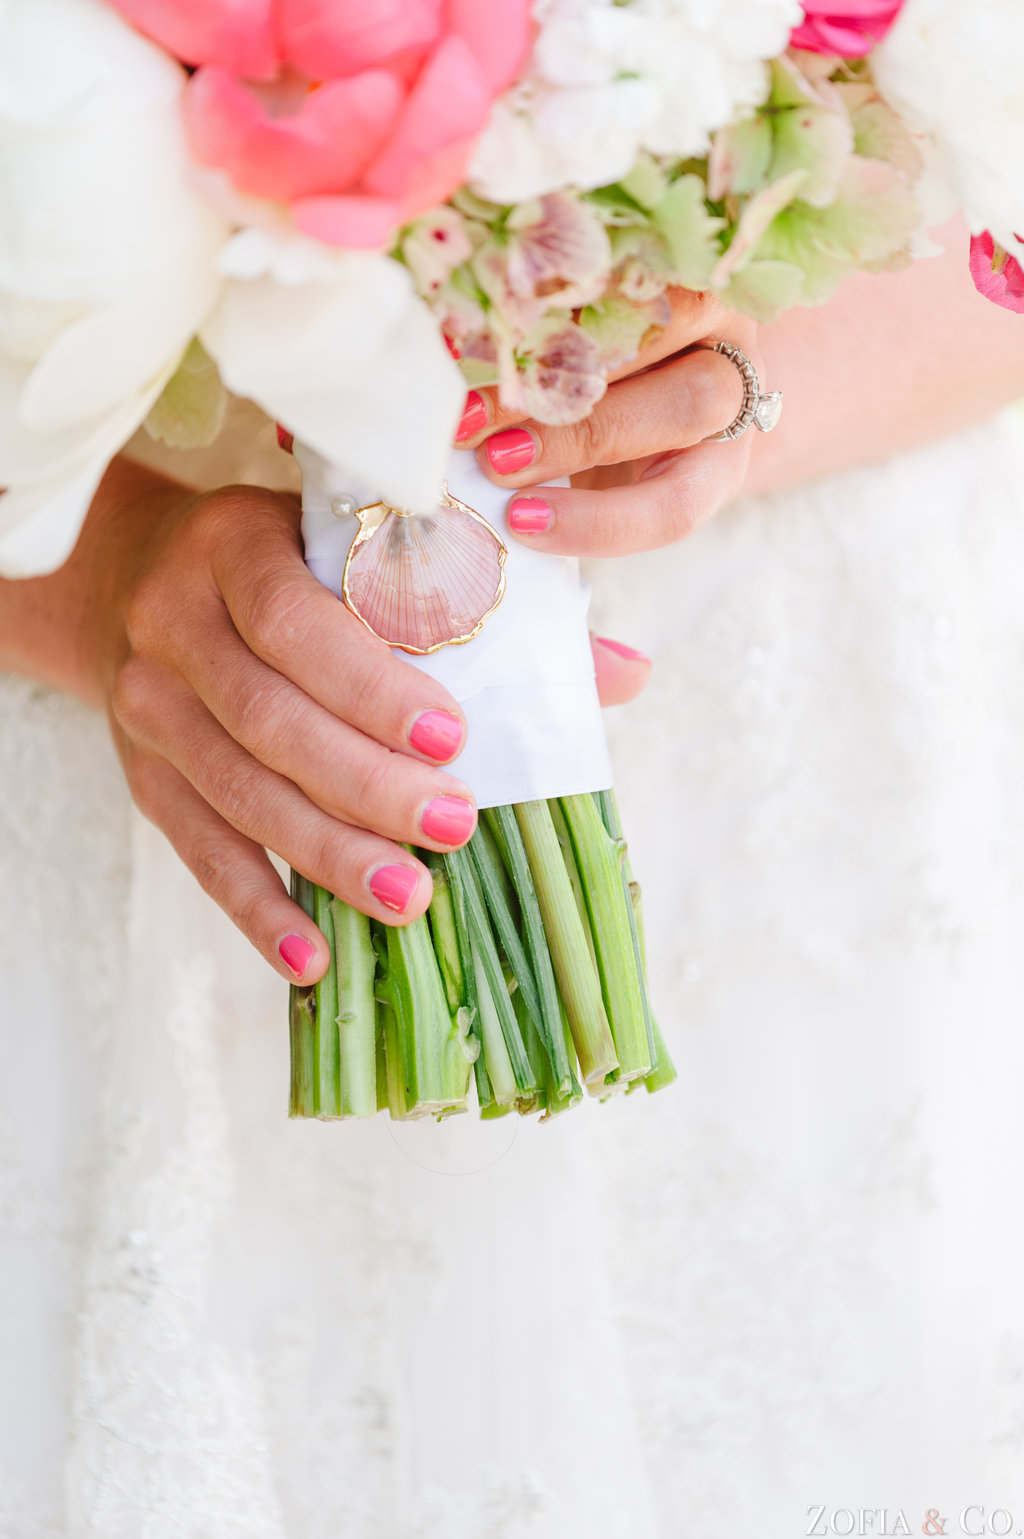 Ceci_New_York_Style_Luxury_Custom_Summer_Wedding_CeciBride_Nautical_Blue_Gold_Letterpress_Foil_40.jpg